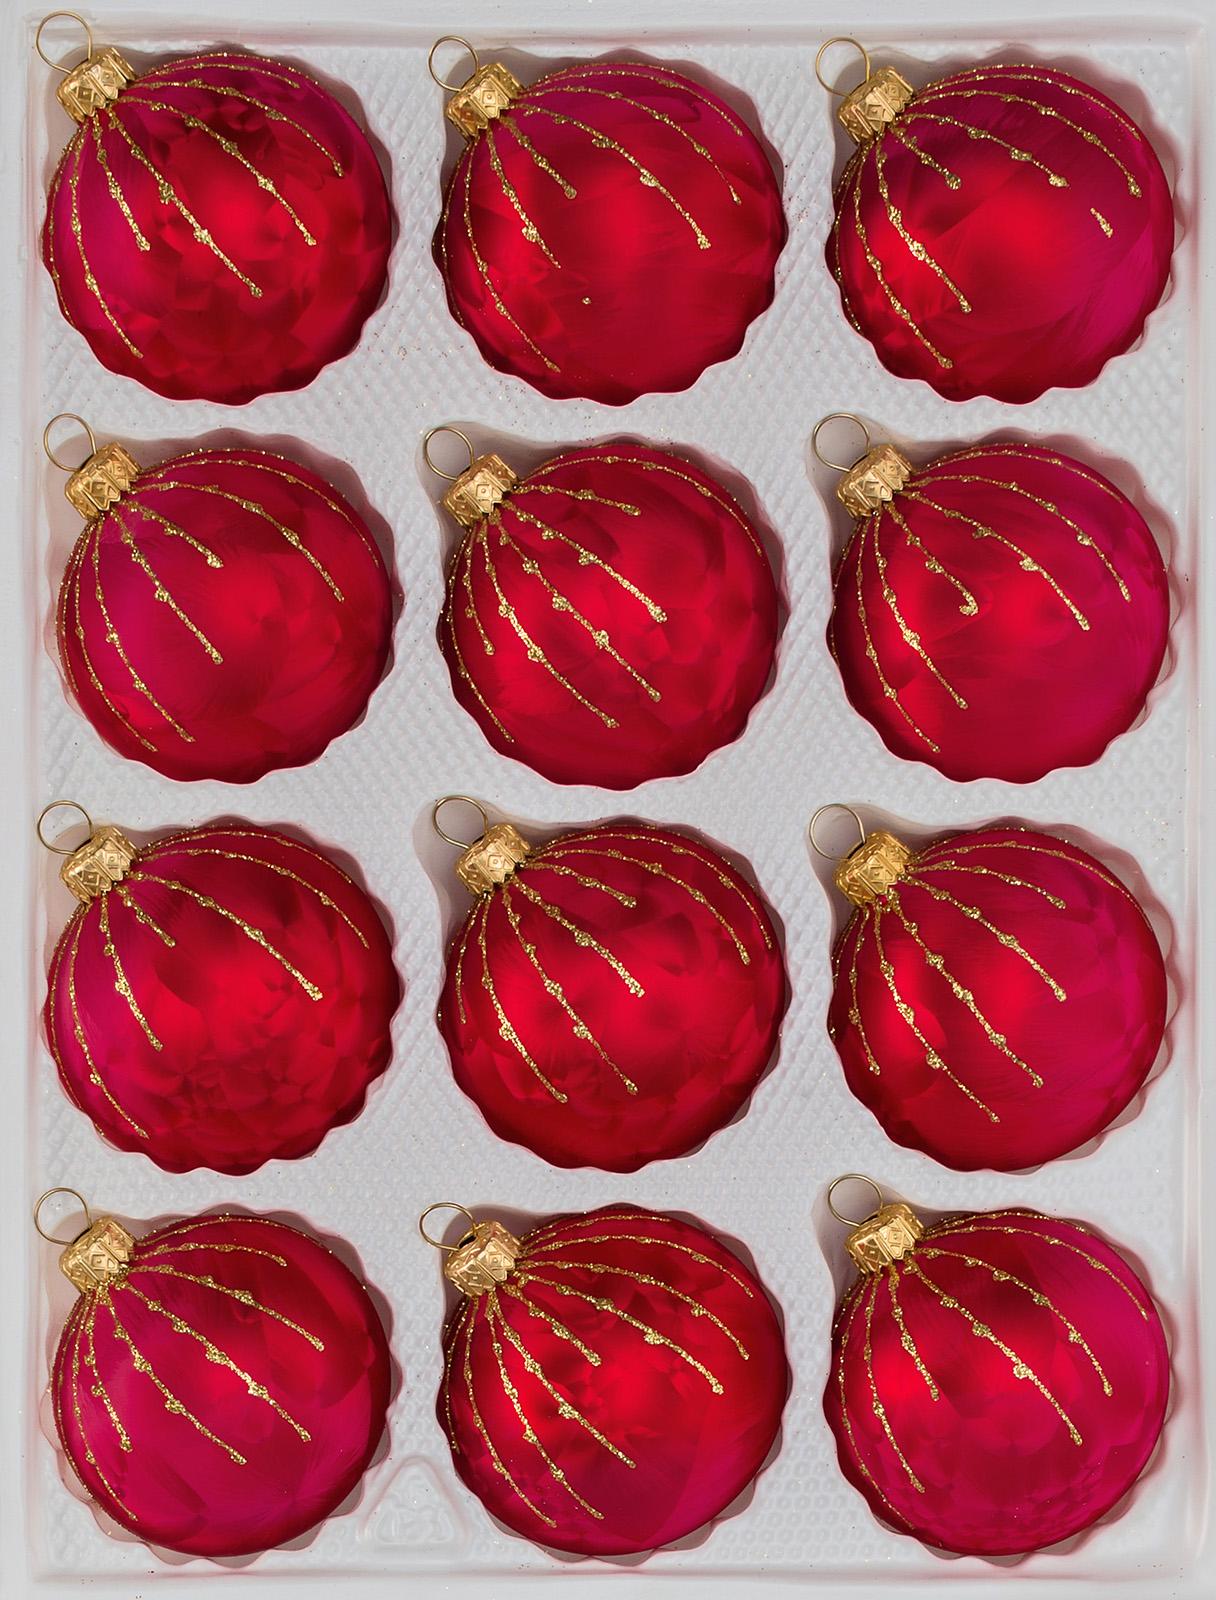 12 pcs. Glass Christmas Balls Set in